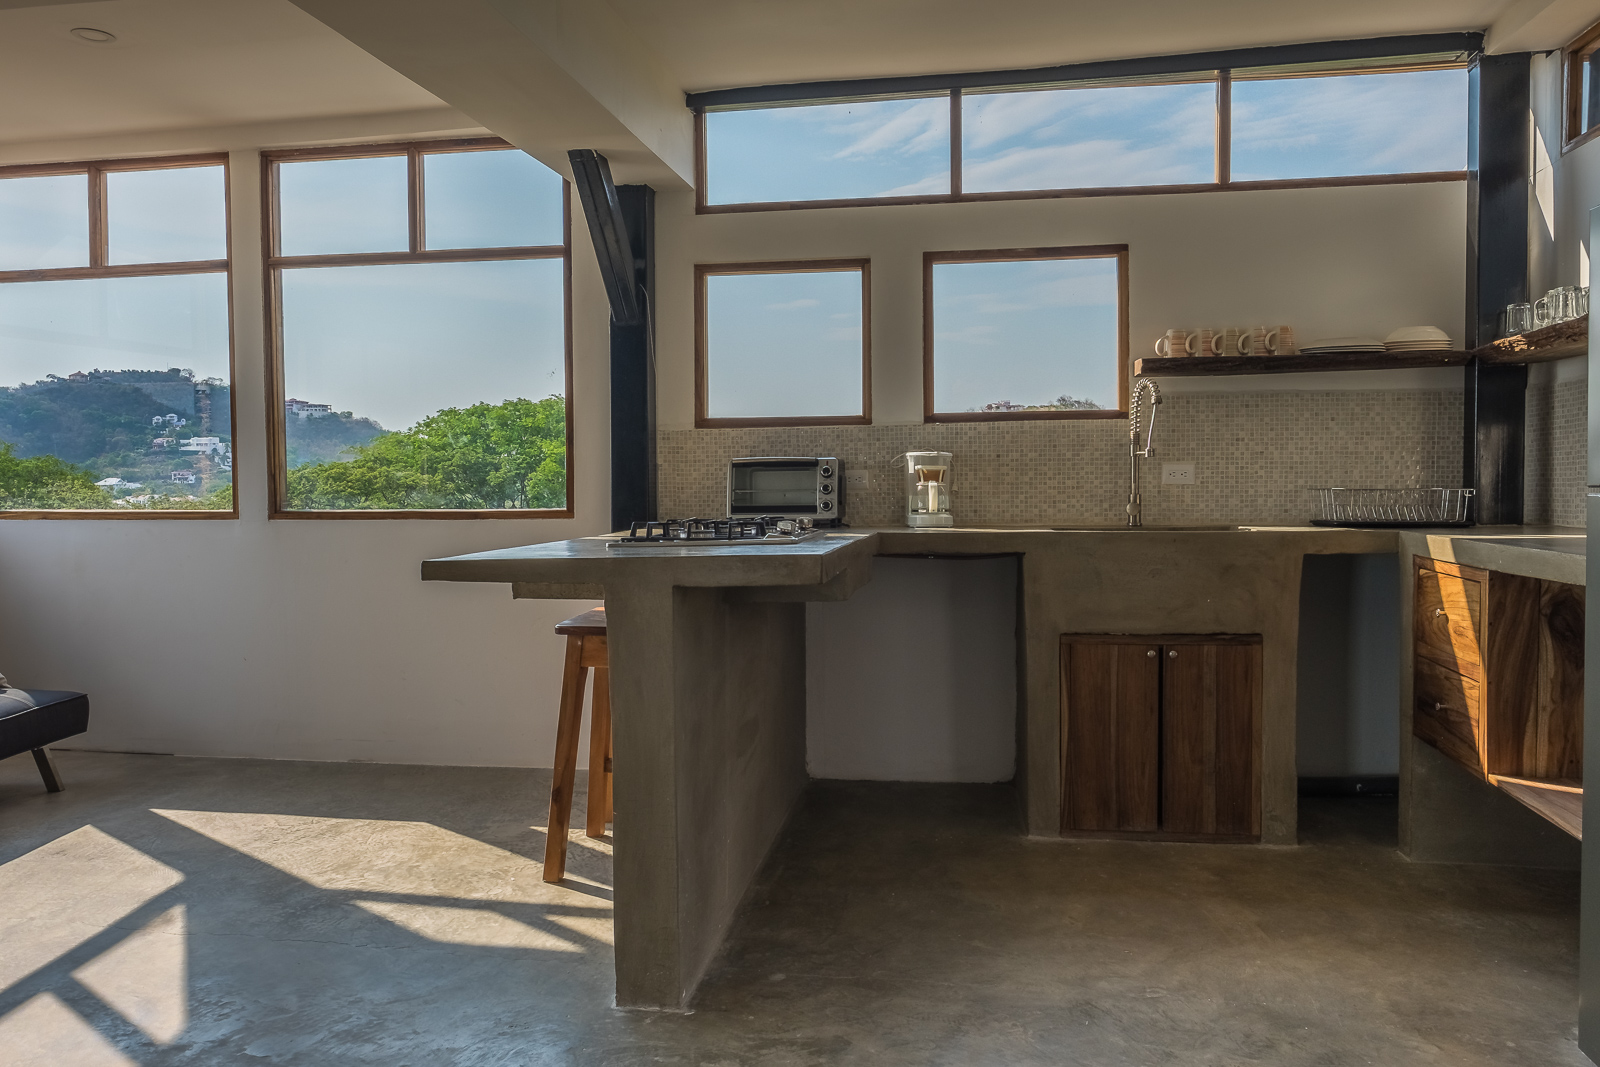 Property for sale in San Juan Del Sur Nicaragua, Social House 3.jpg